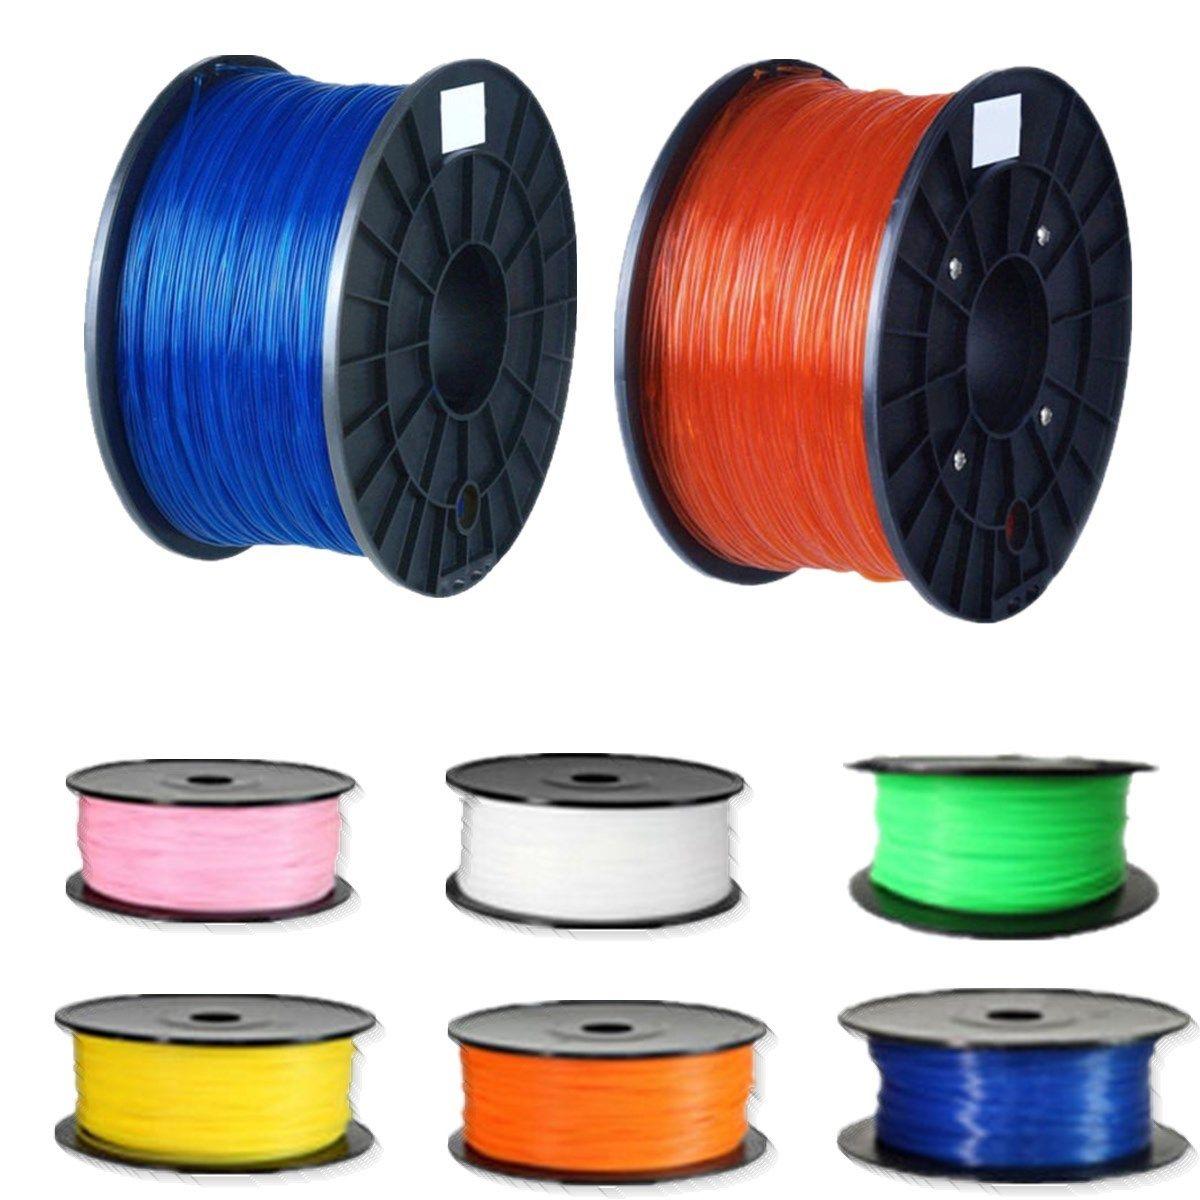 PLA 3d Printer Filament 1.75mm 10M  6 colors Optional for MakerBot RepRap 3D printing Accessories PLA material